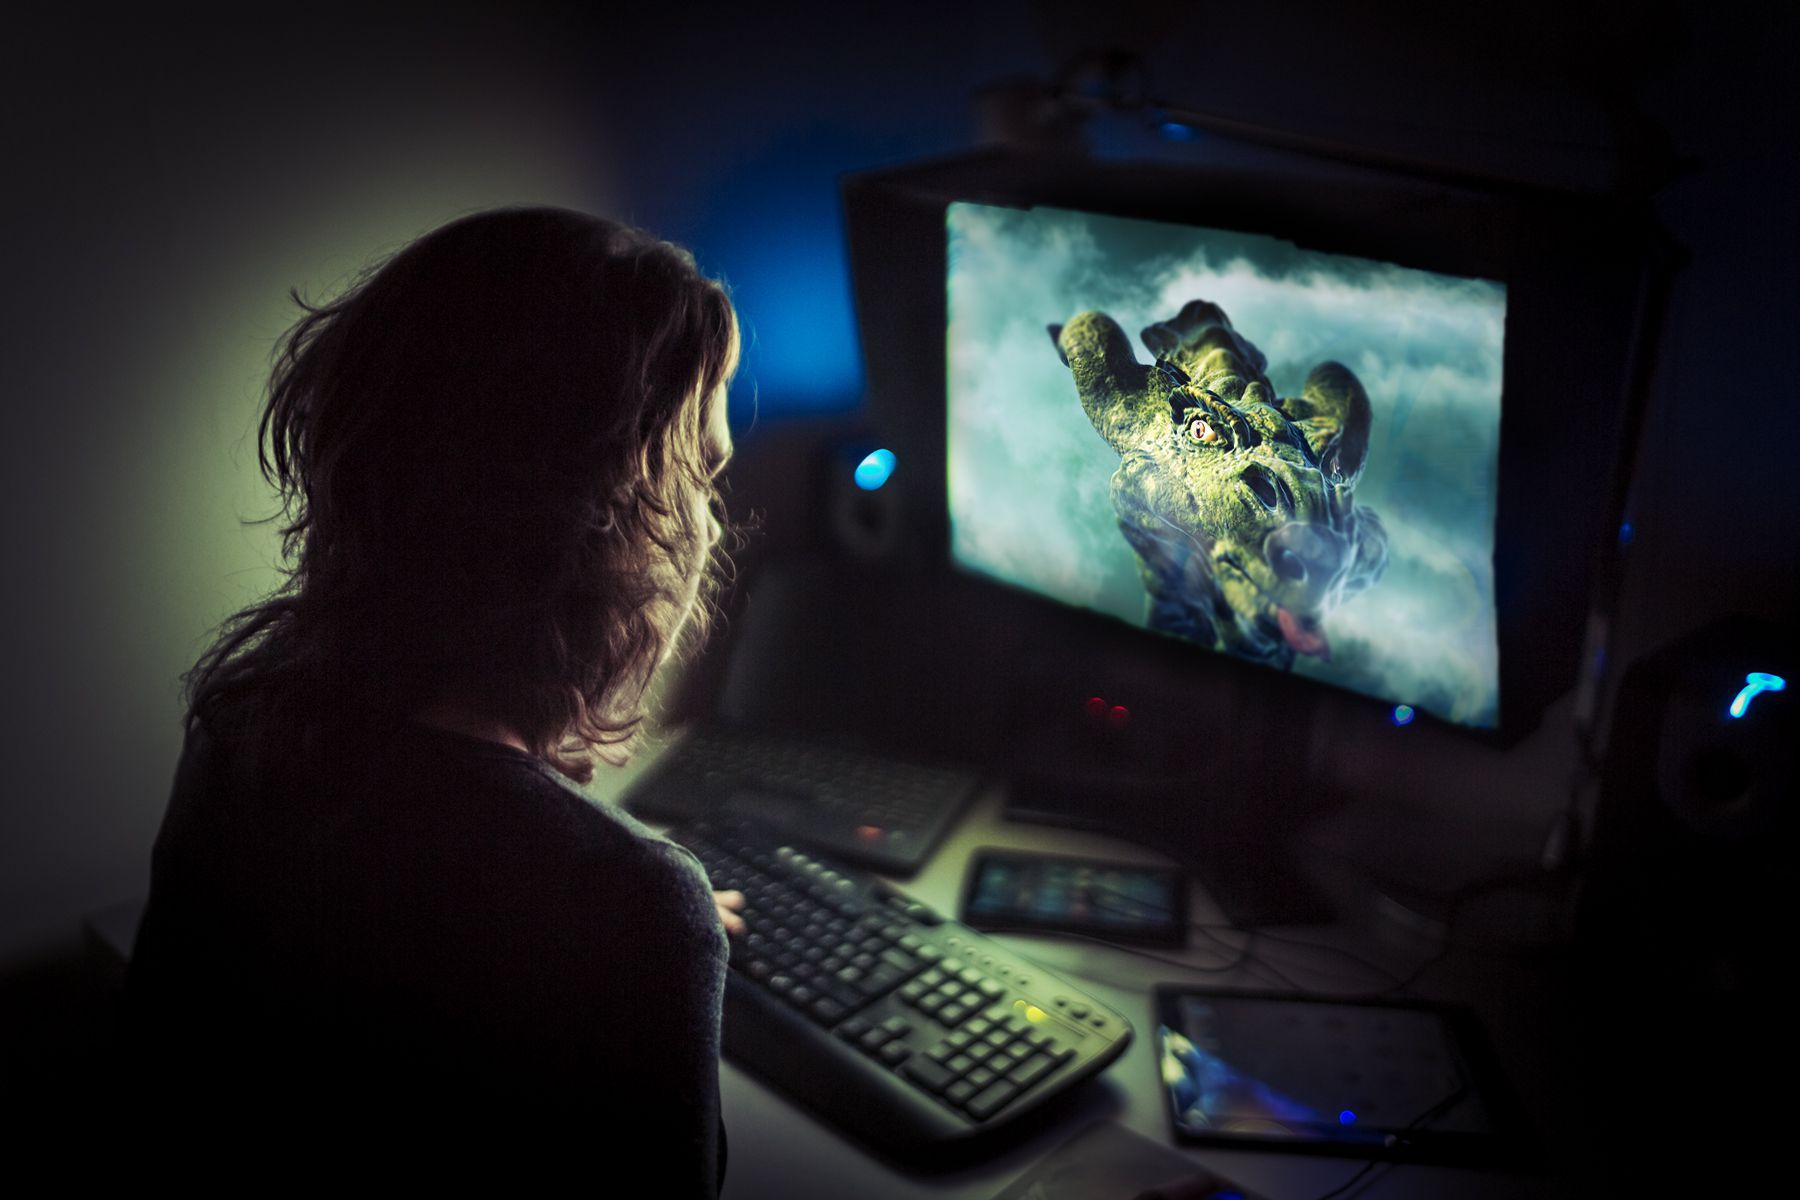 Computer gamer playing late at night